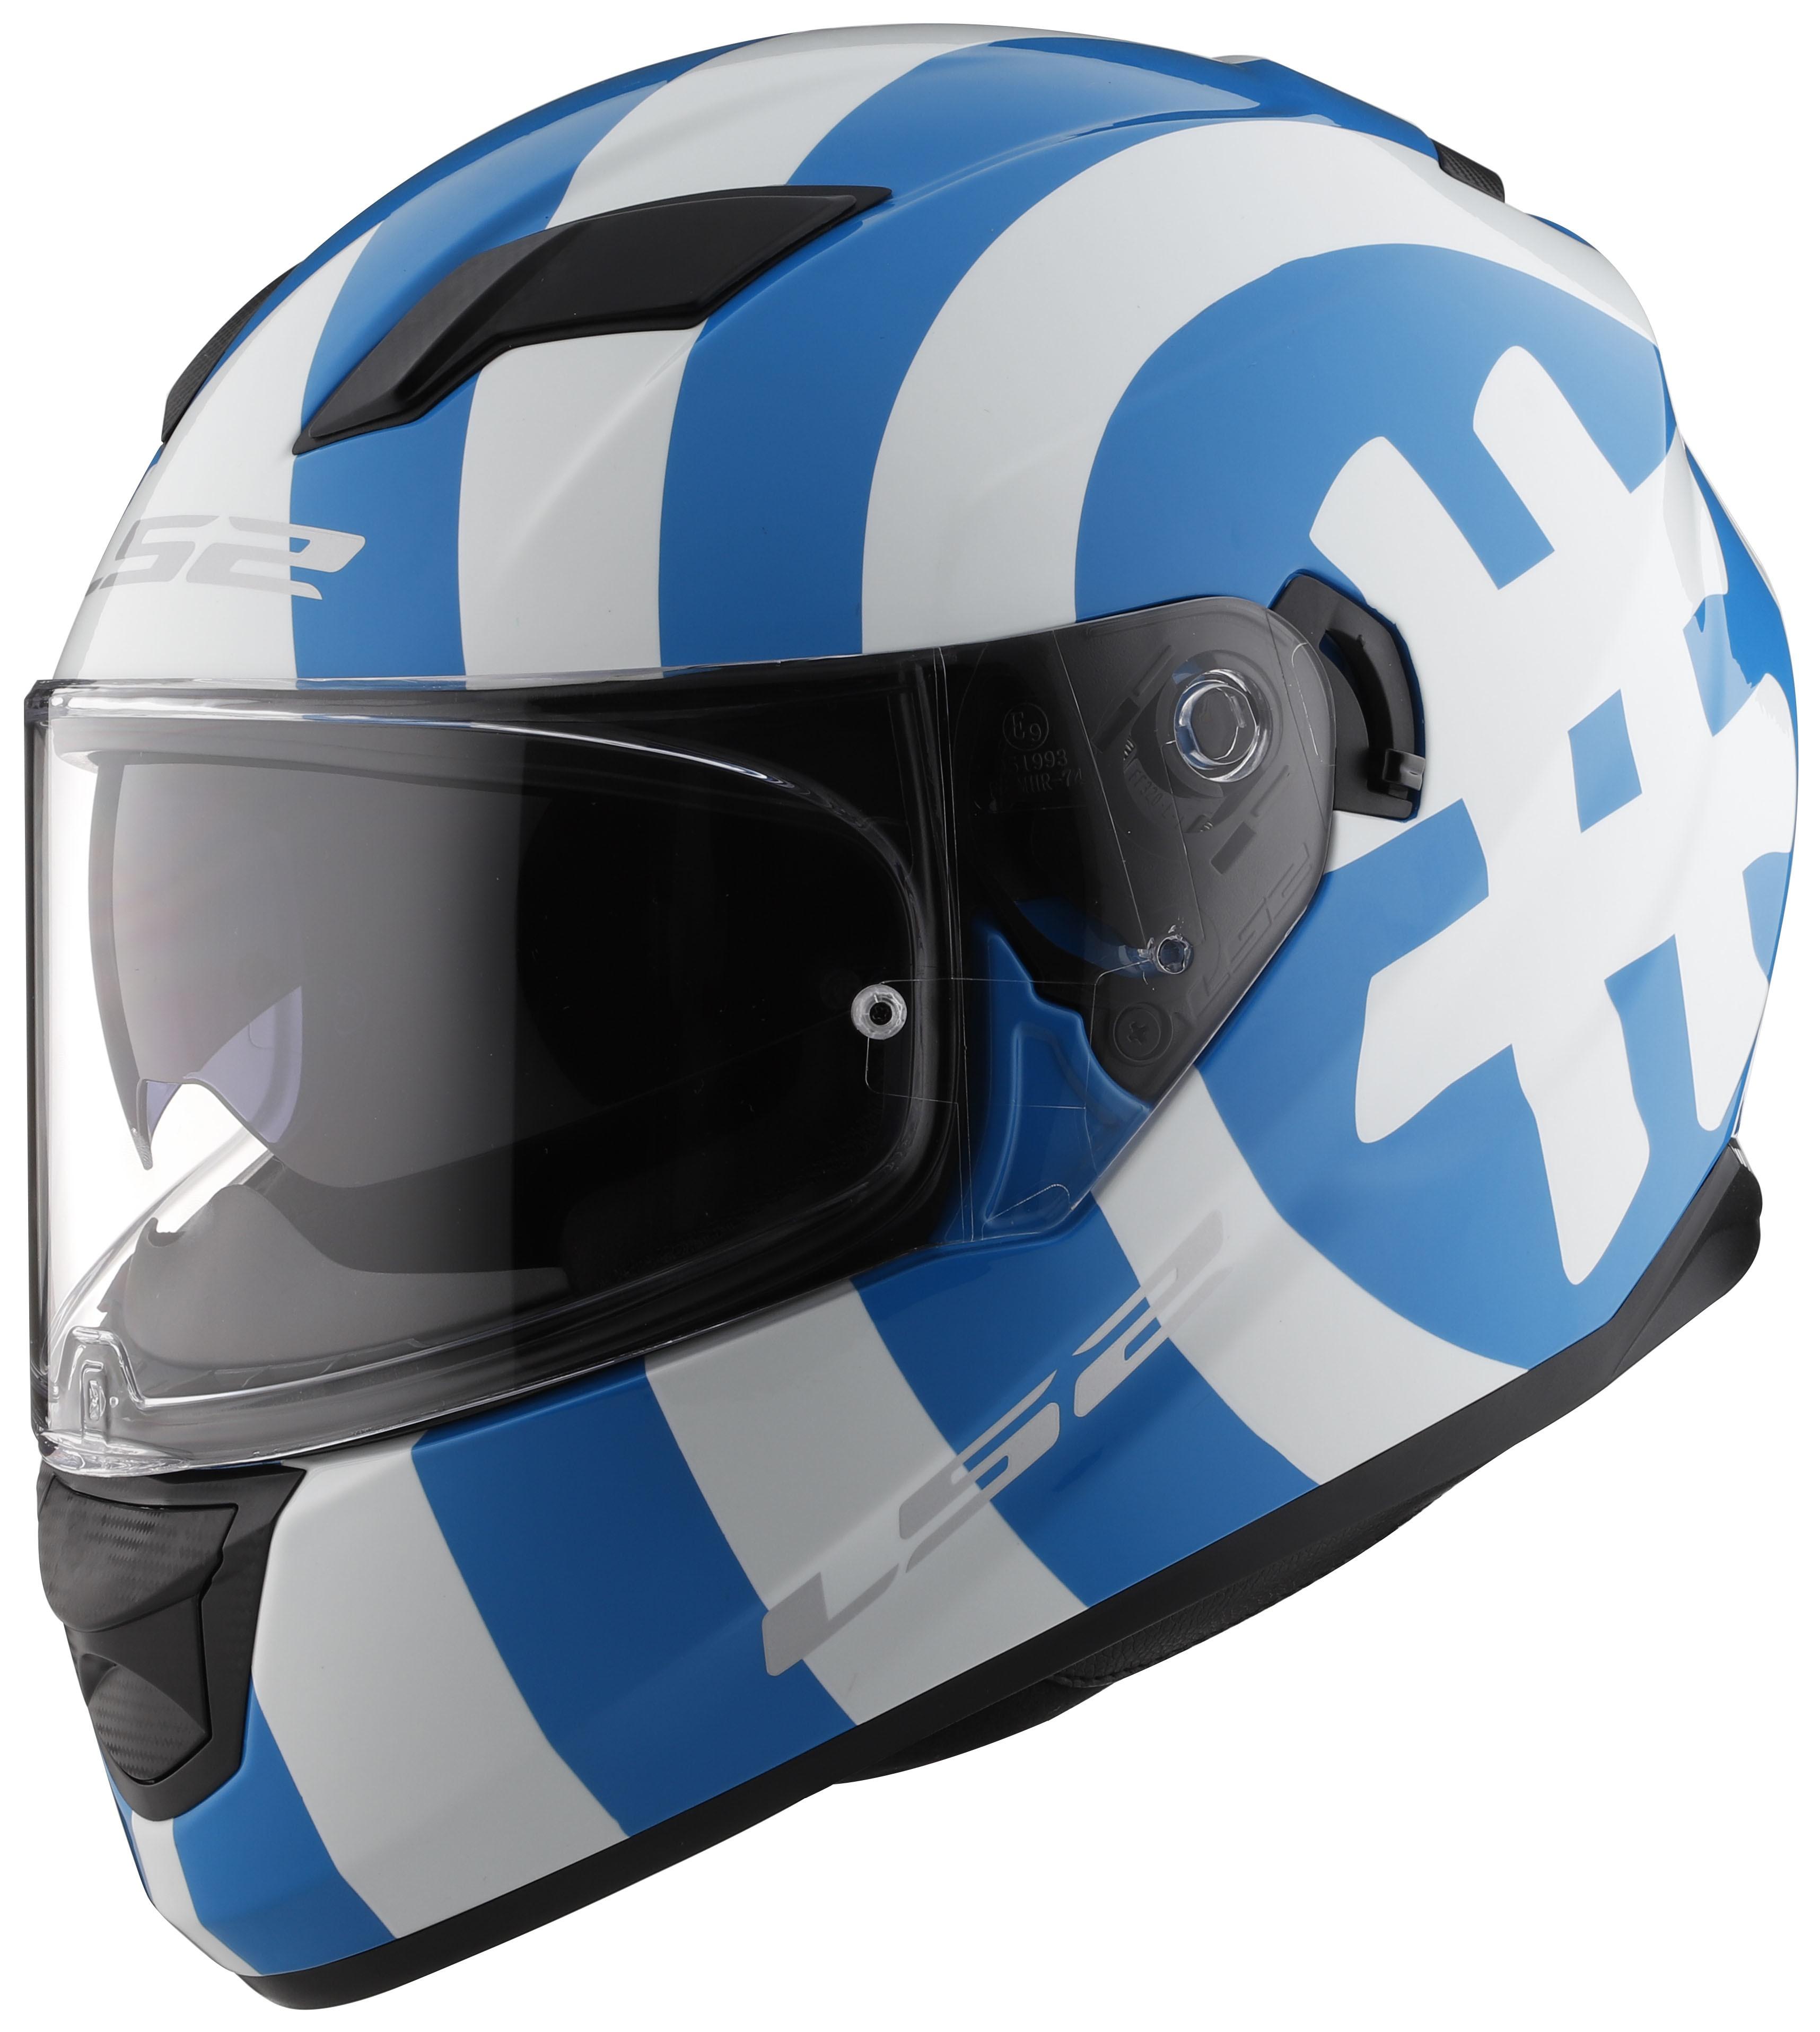 Ls2 stream hashtag glow in the dark helmet revzilla